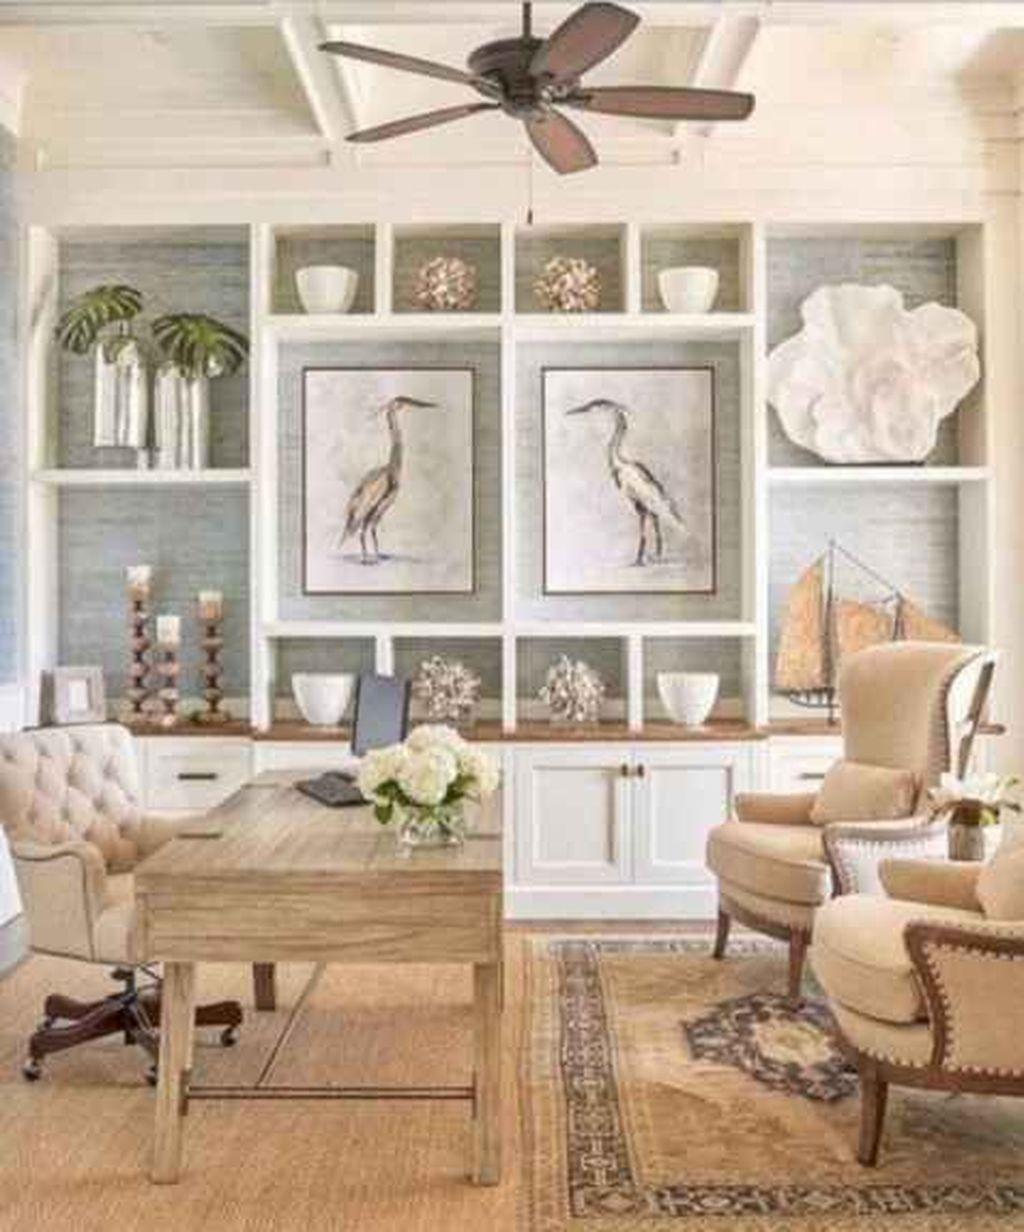 Inspiring Beachy Farmhouse Living Room Decor Ideas 34